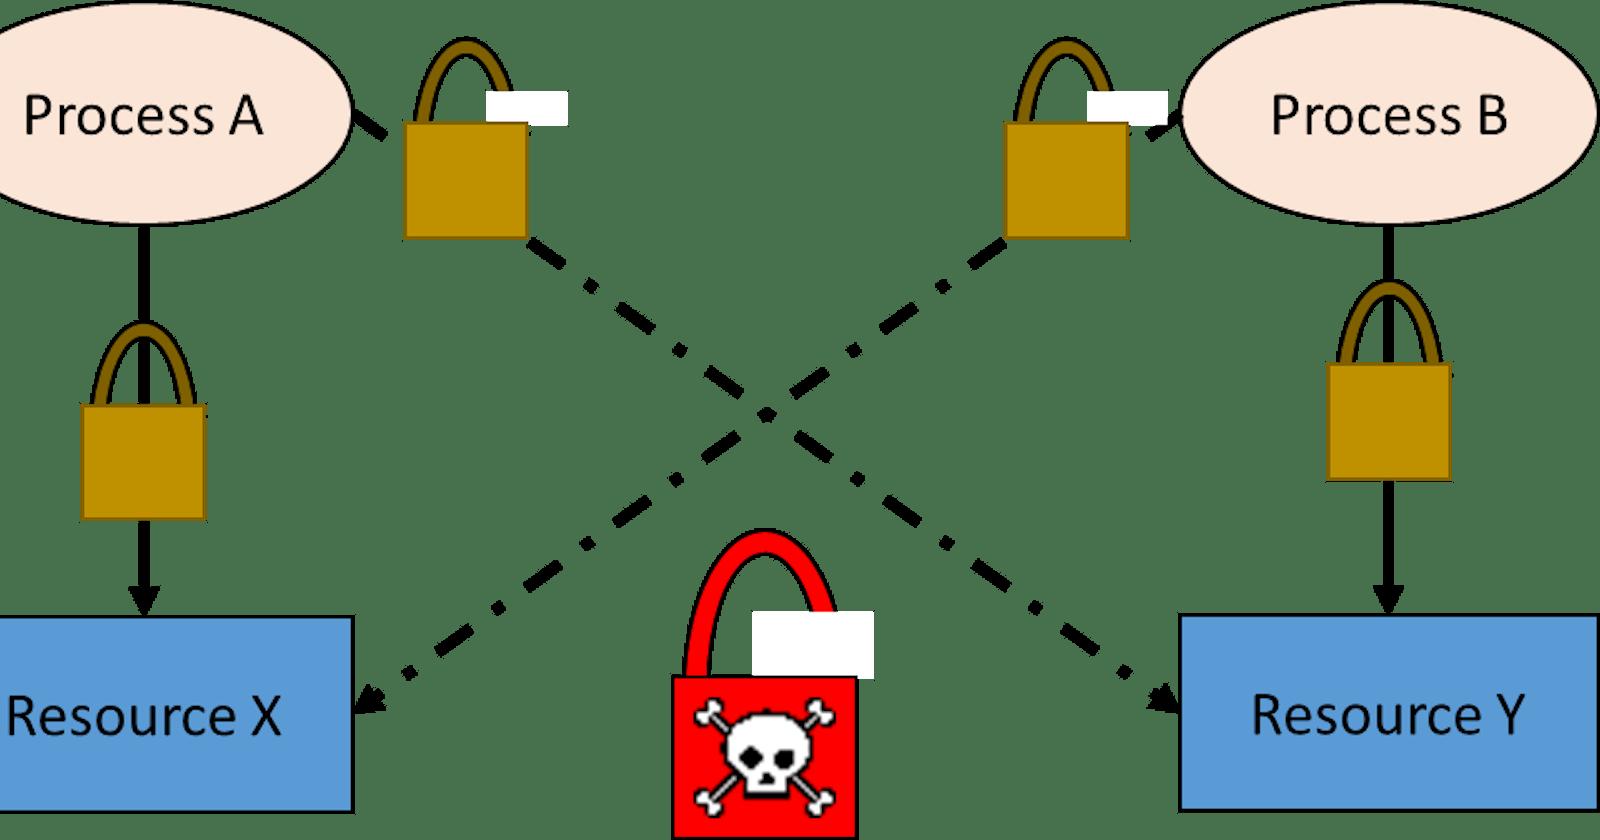 Deadlock prevention & necessary conditions to occur